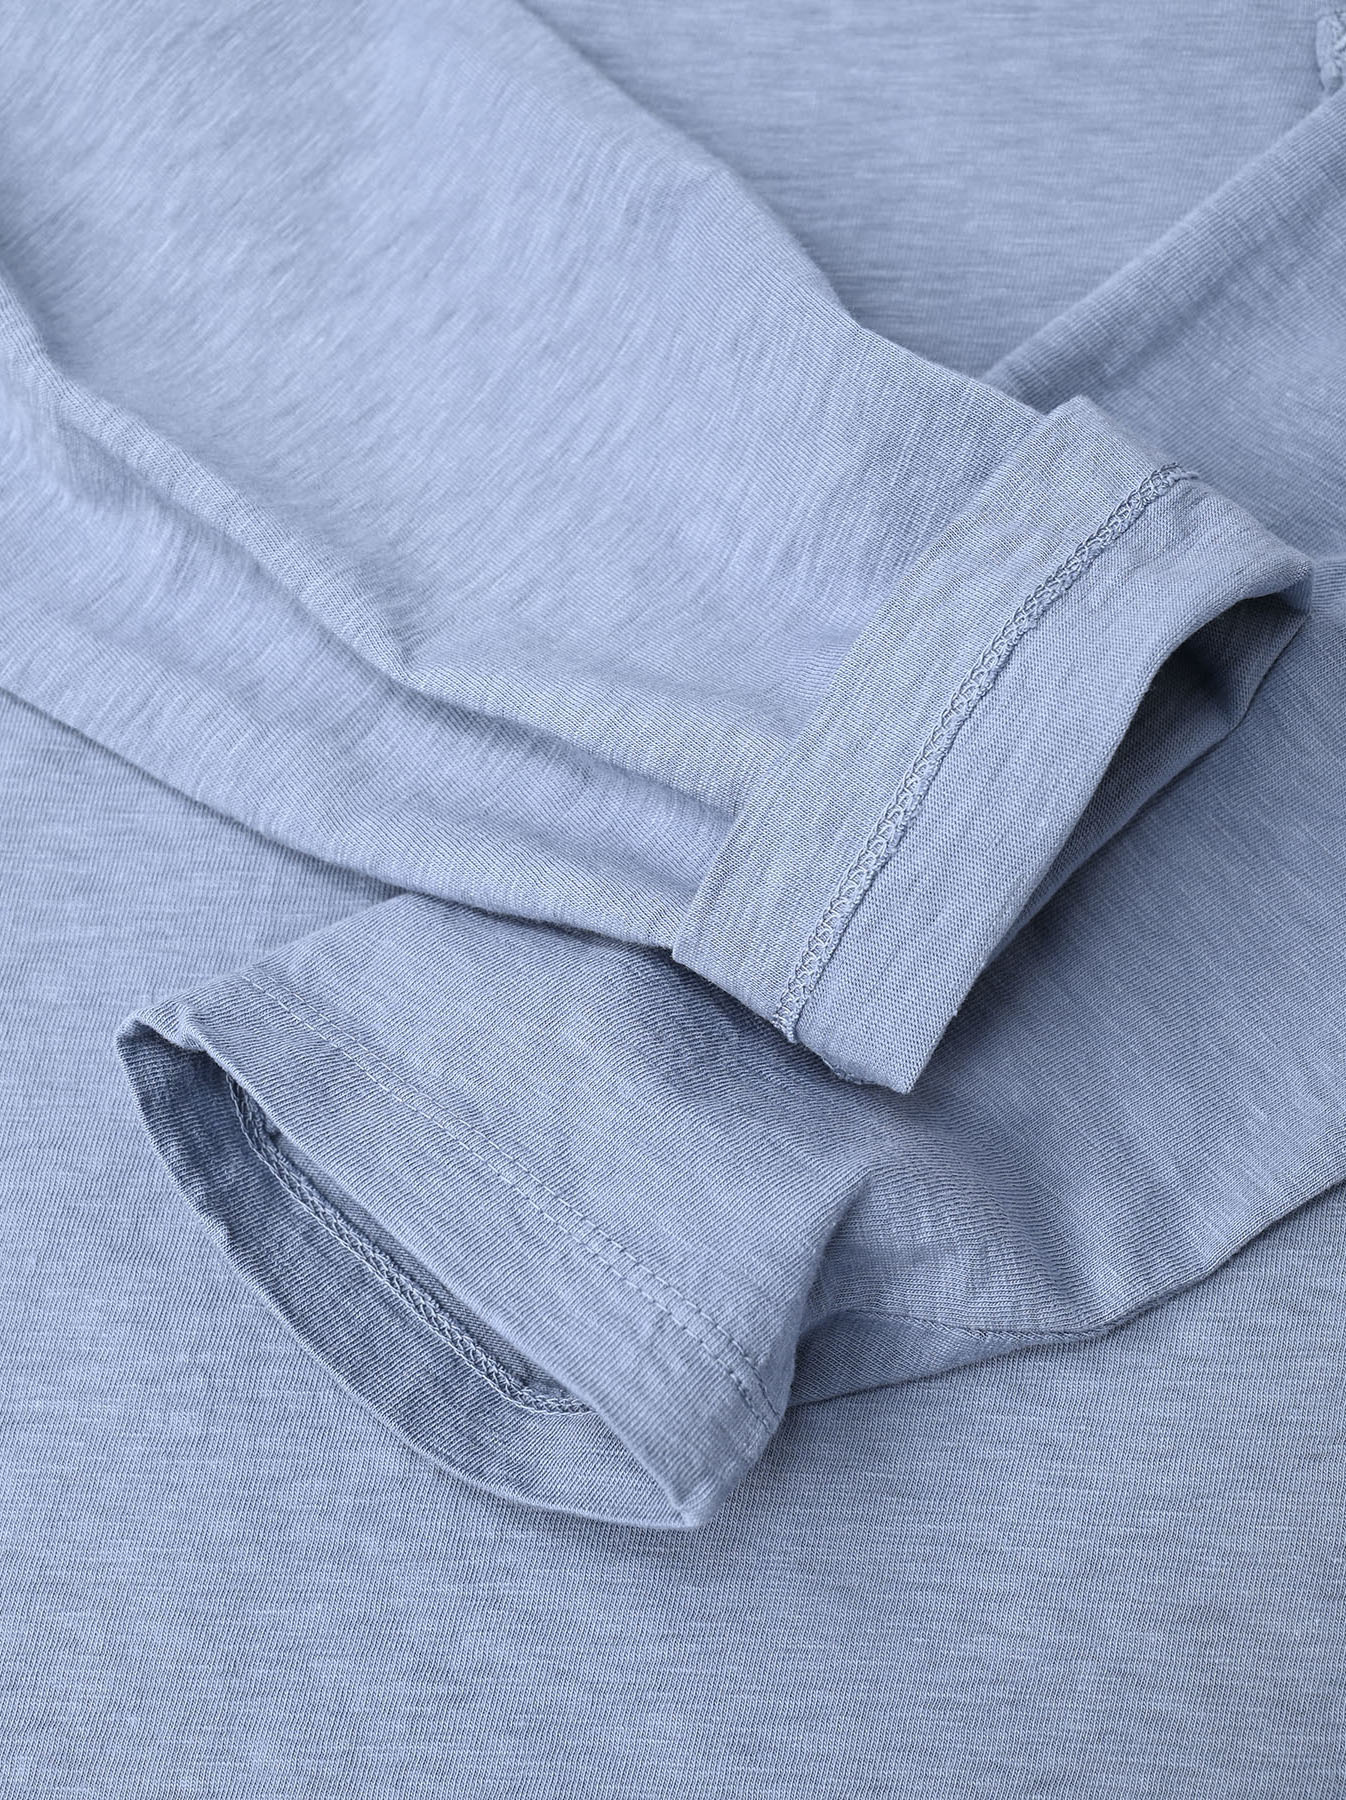 Zimbabwe Cotton 908 Ocean Long-sleeved T-shirt-12